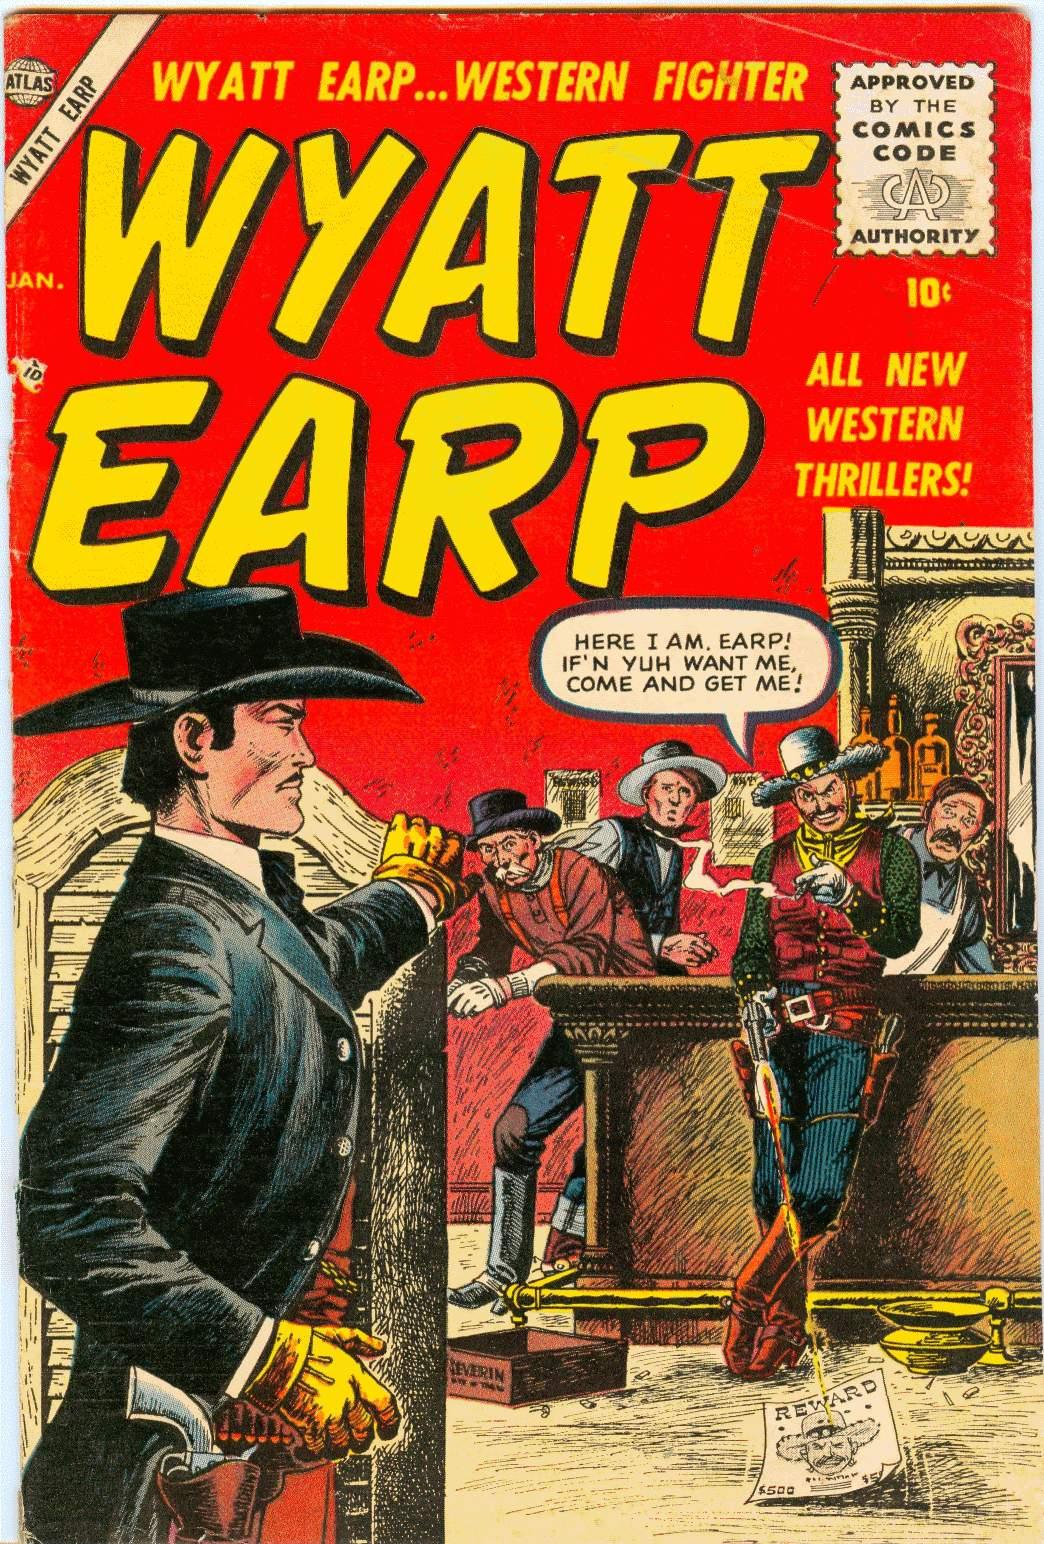 Wyatt Earp (1955) #2, cover by John Severin.